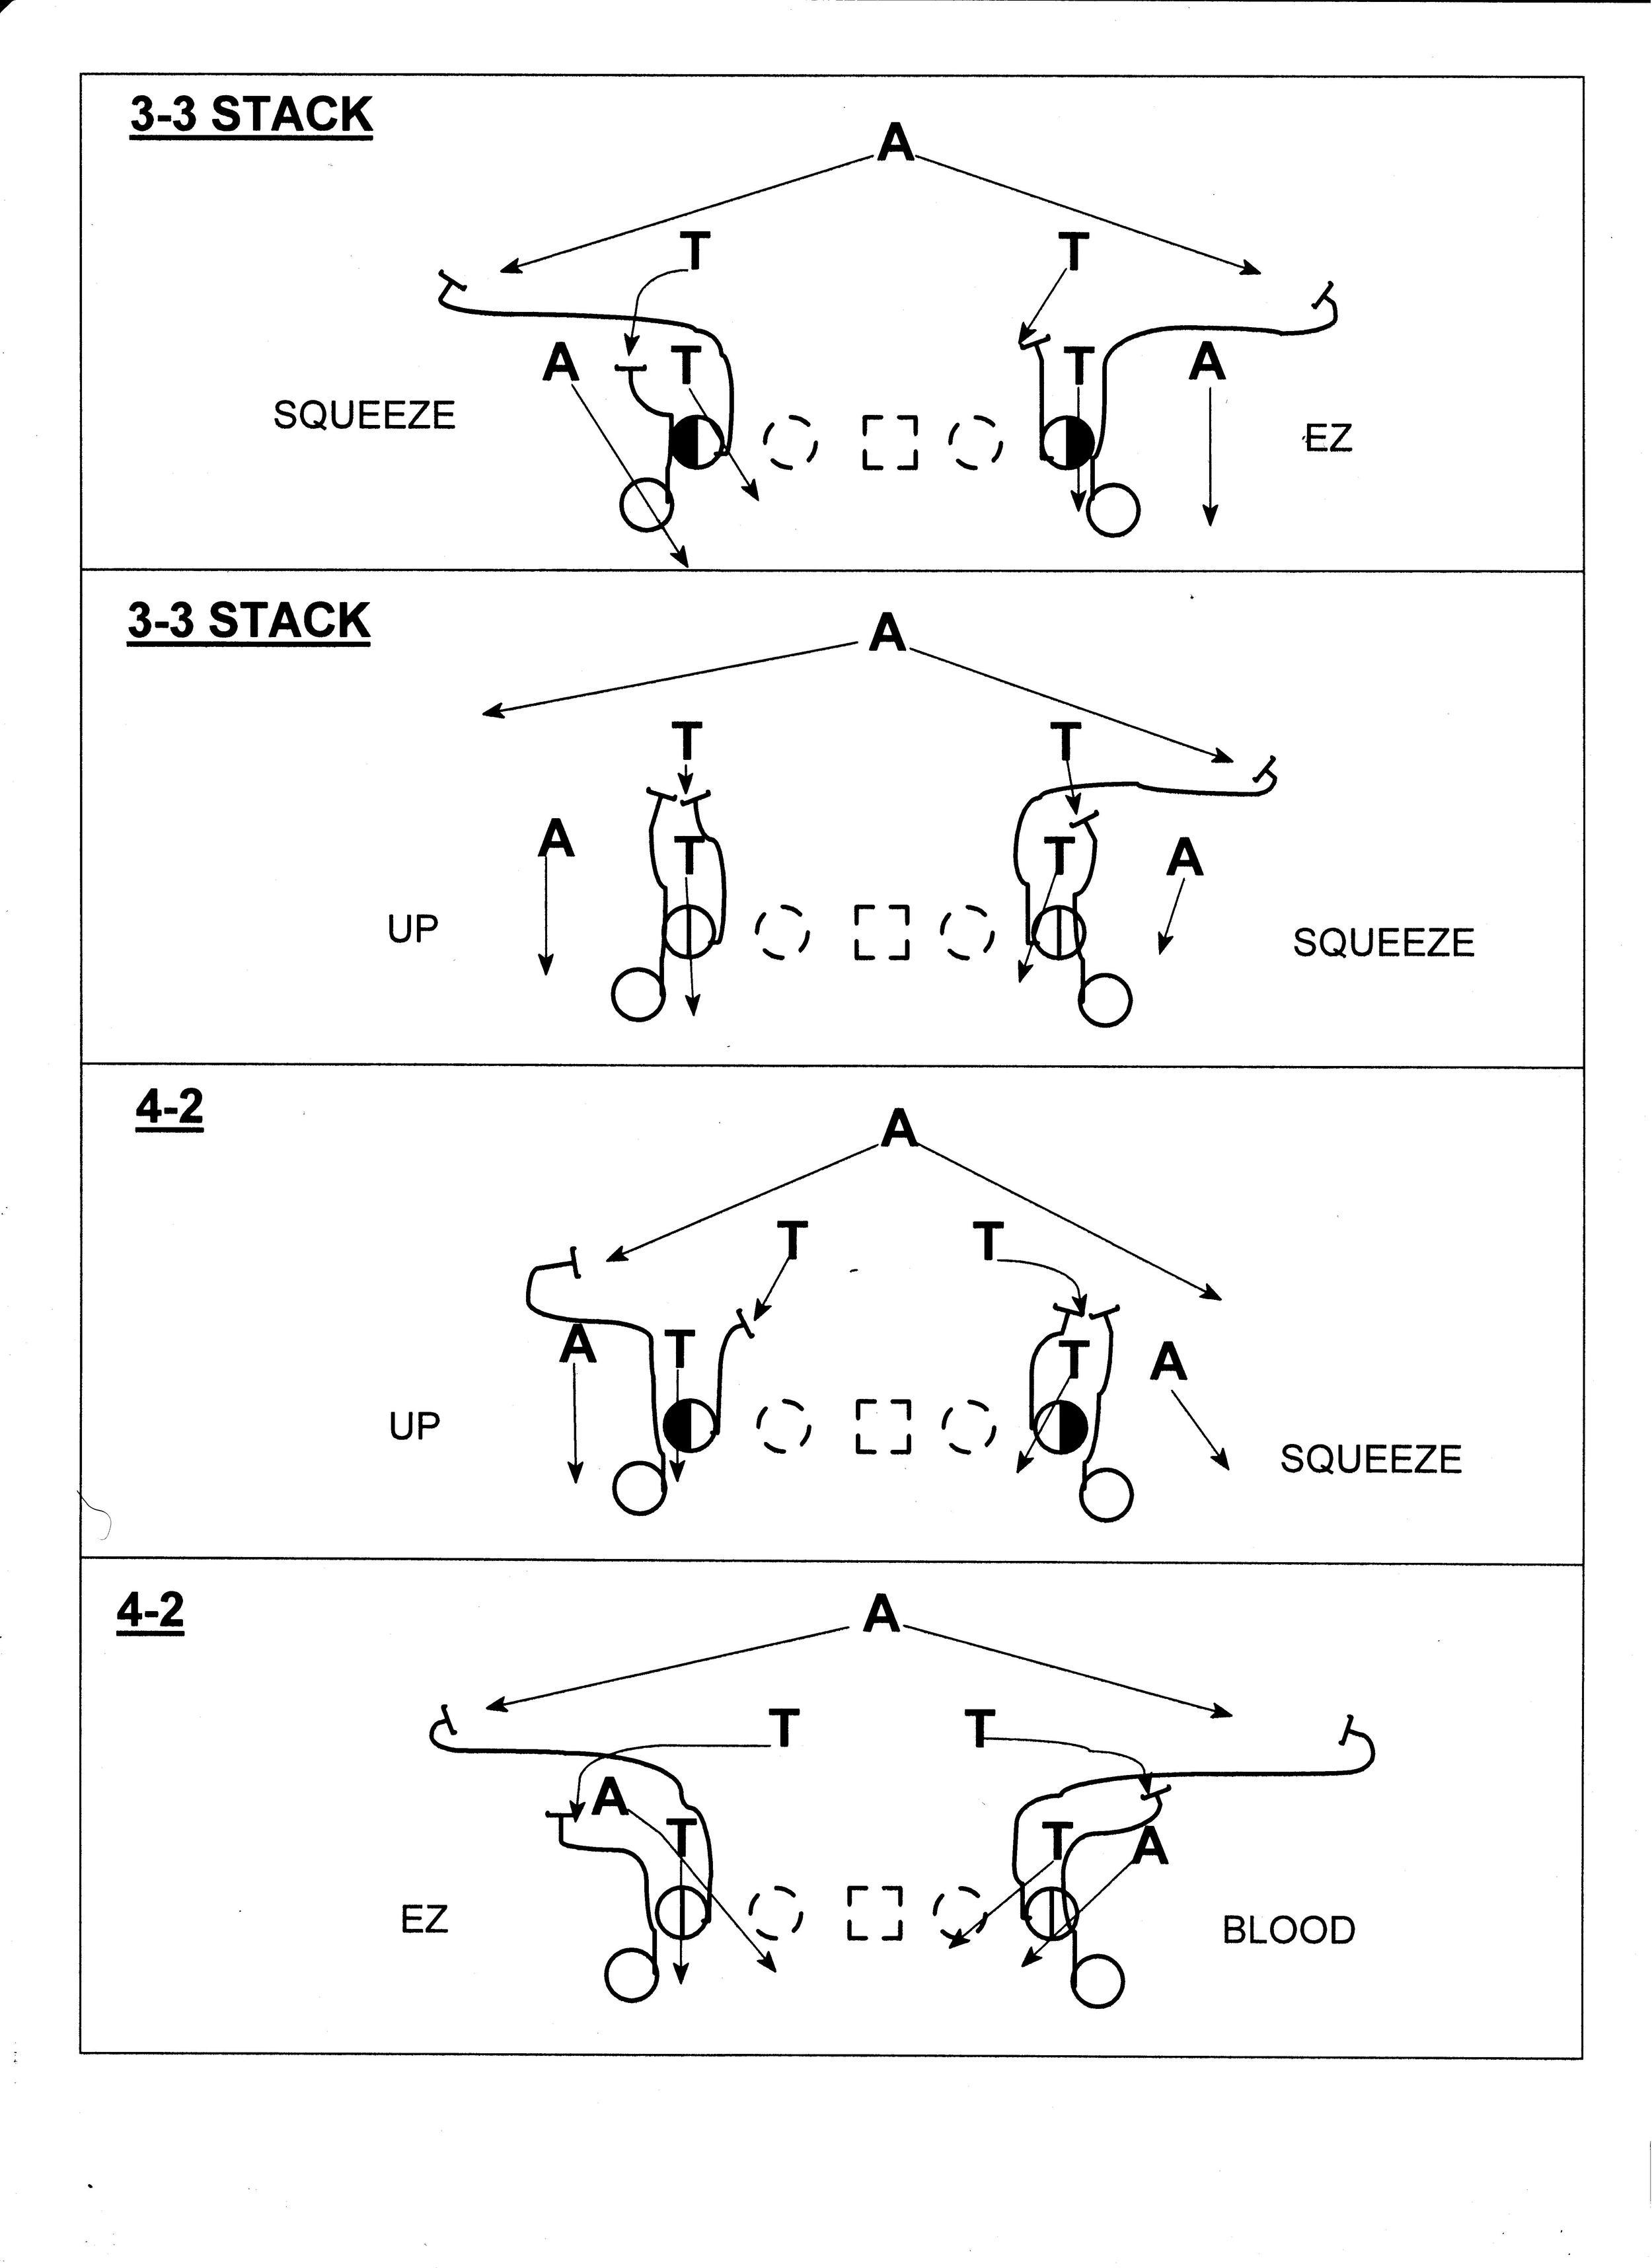 Defensive Movements/Stunts - LOAD Tag (Inside Veer)